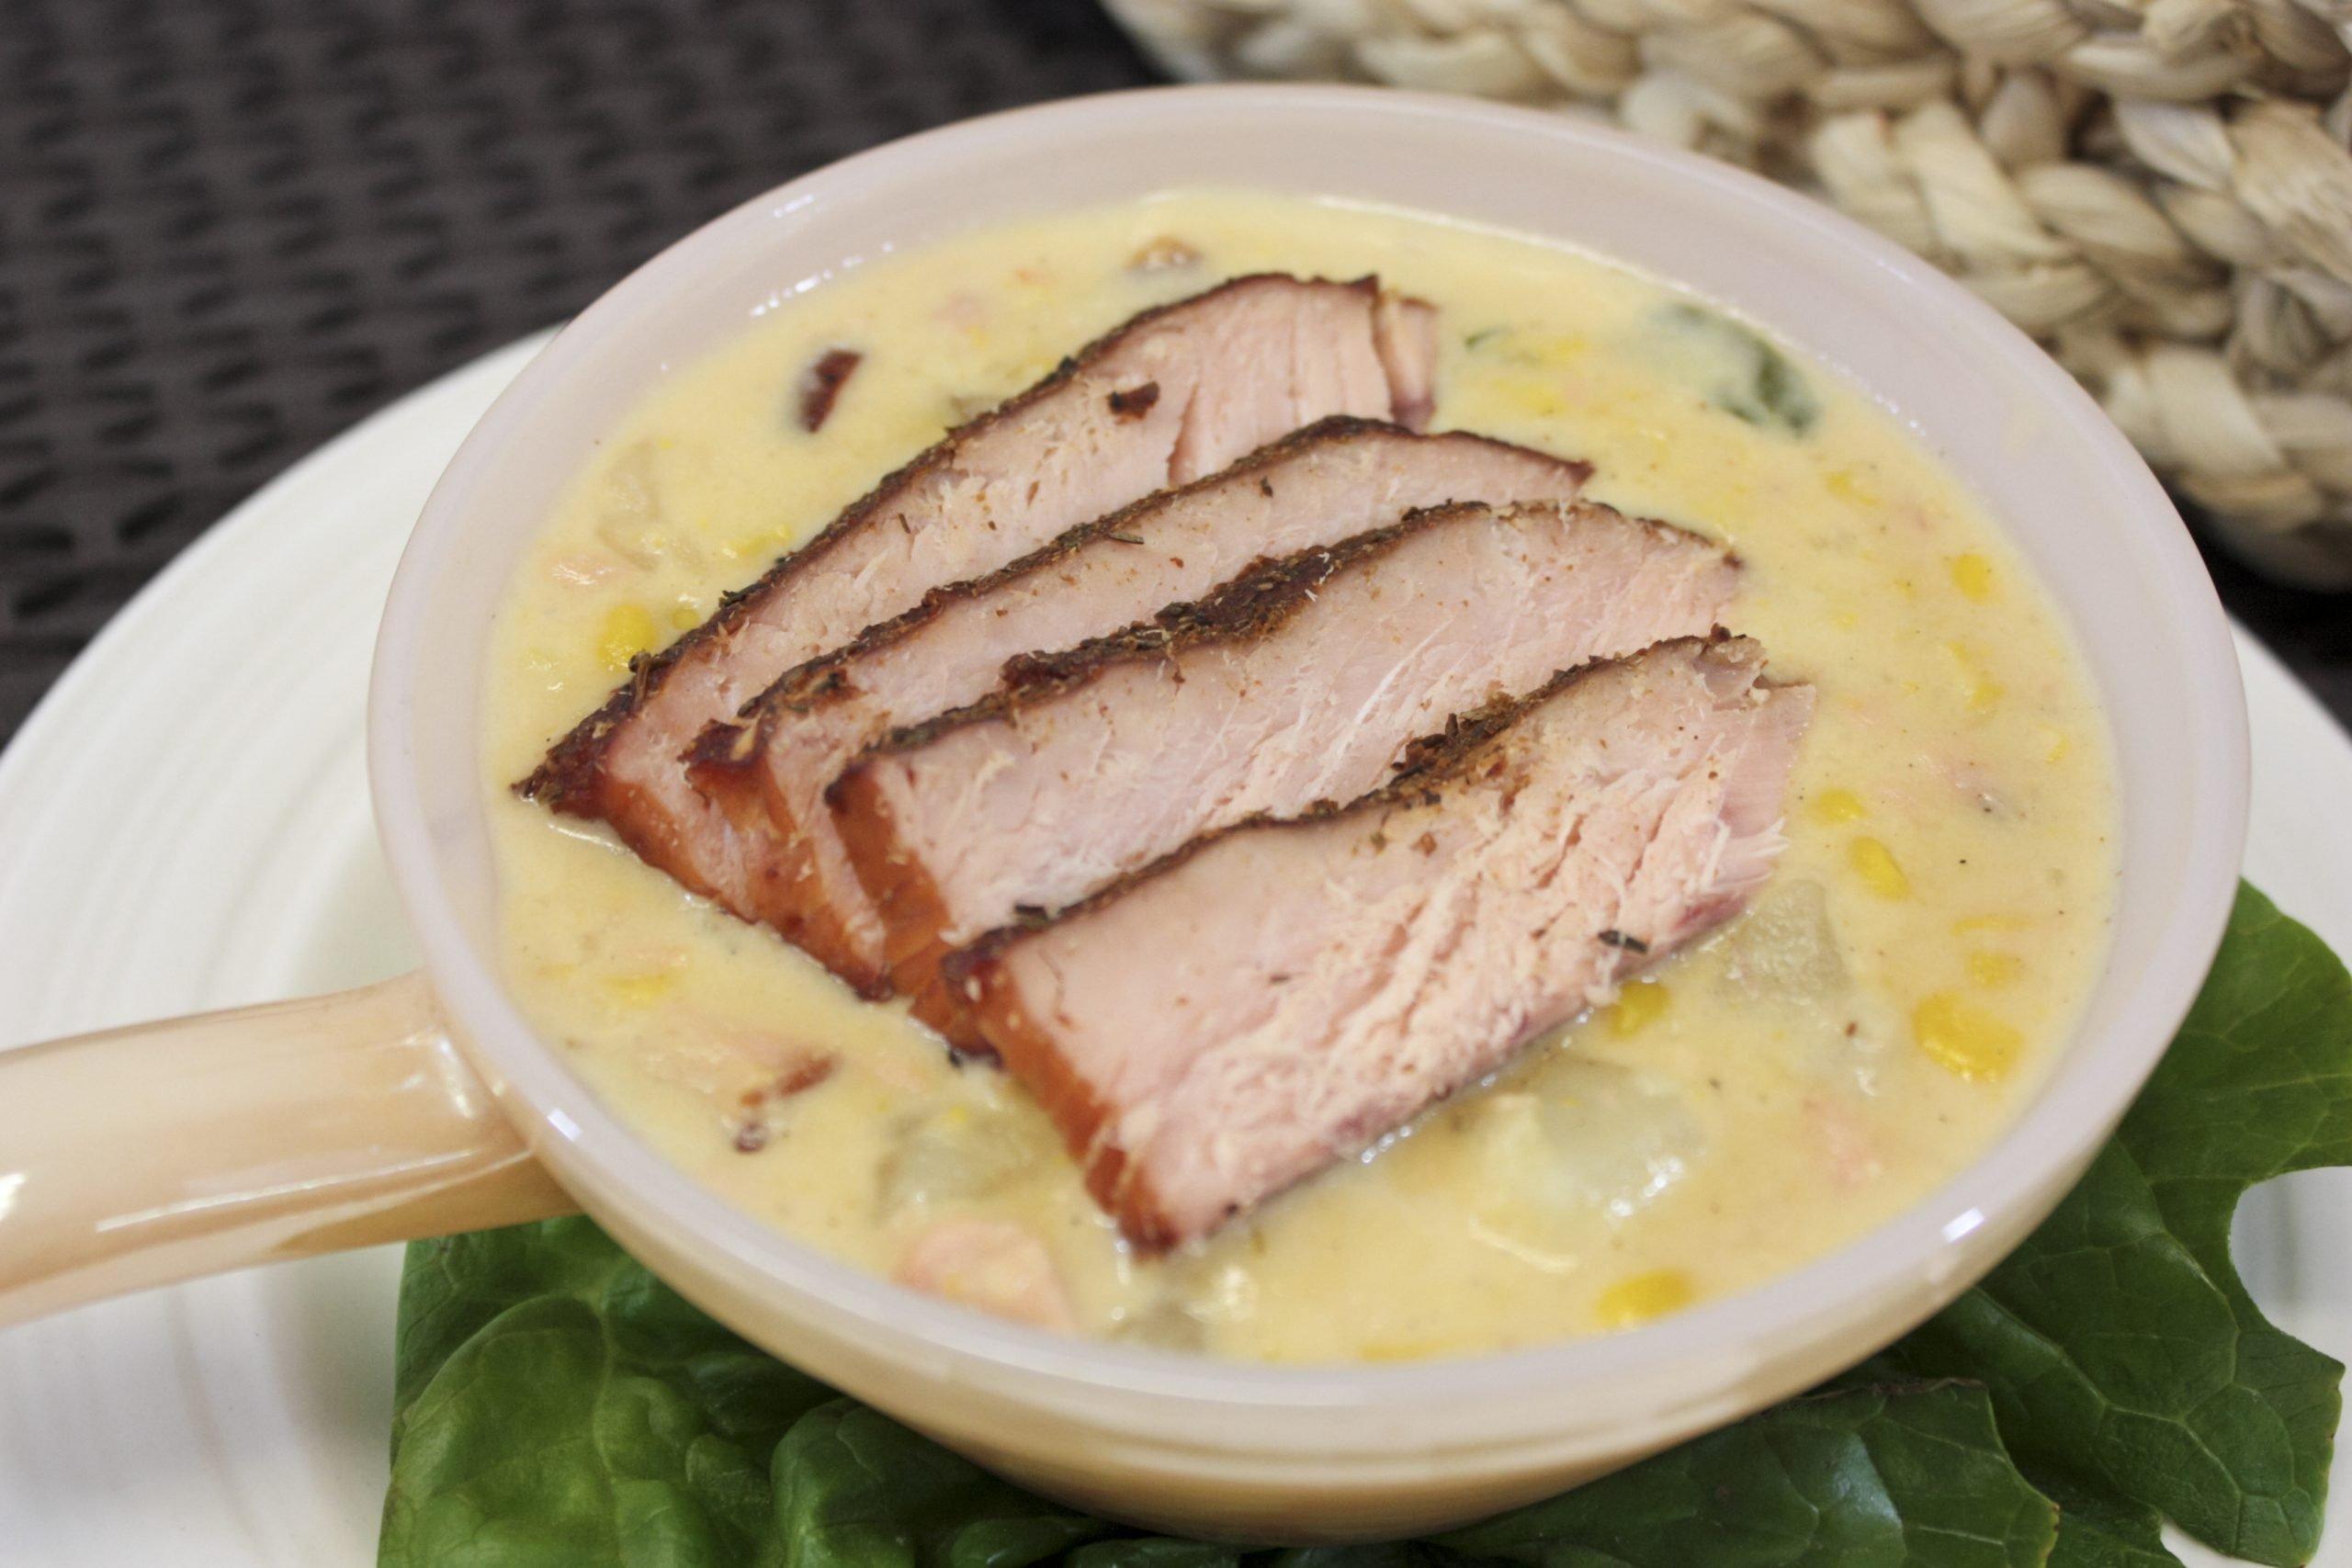 Morey's Salmon Corn Chowder